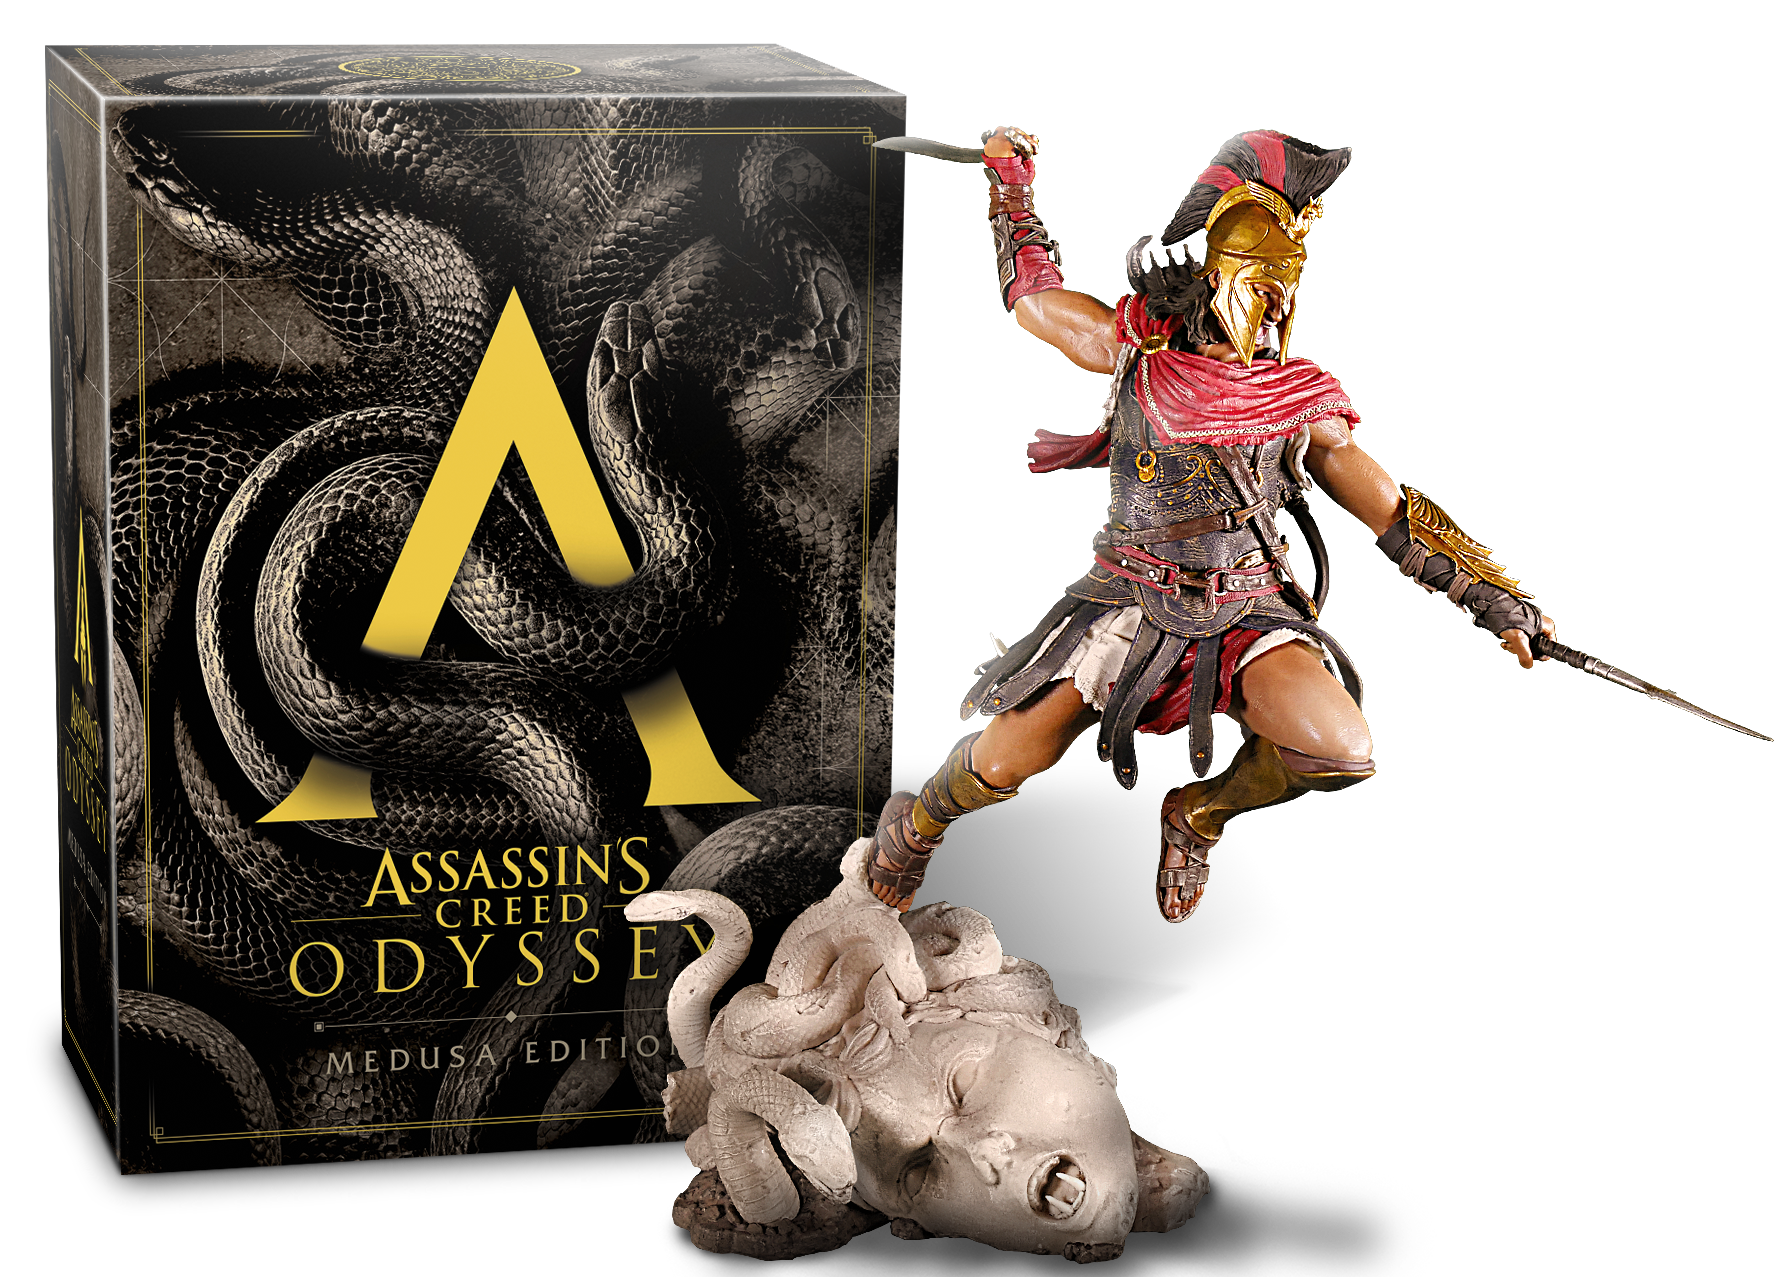 Medusa Edition Assassins Creed Odyssey Assassins Creed